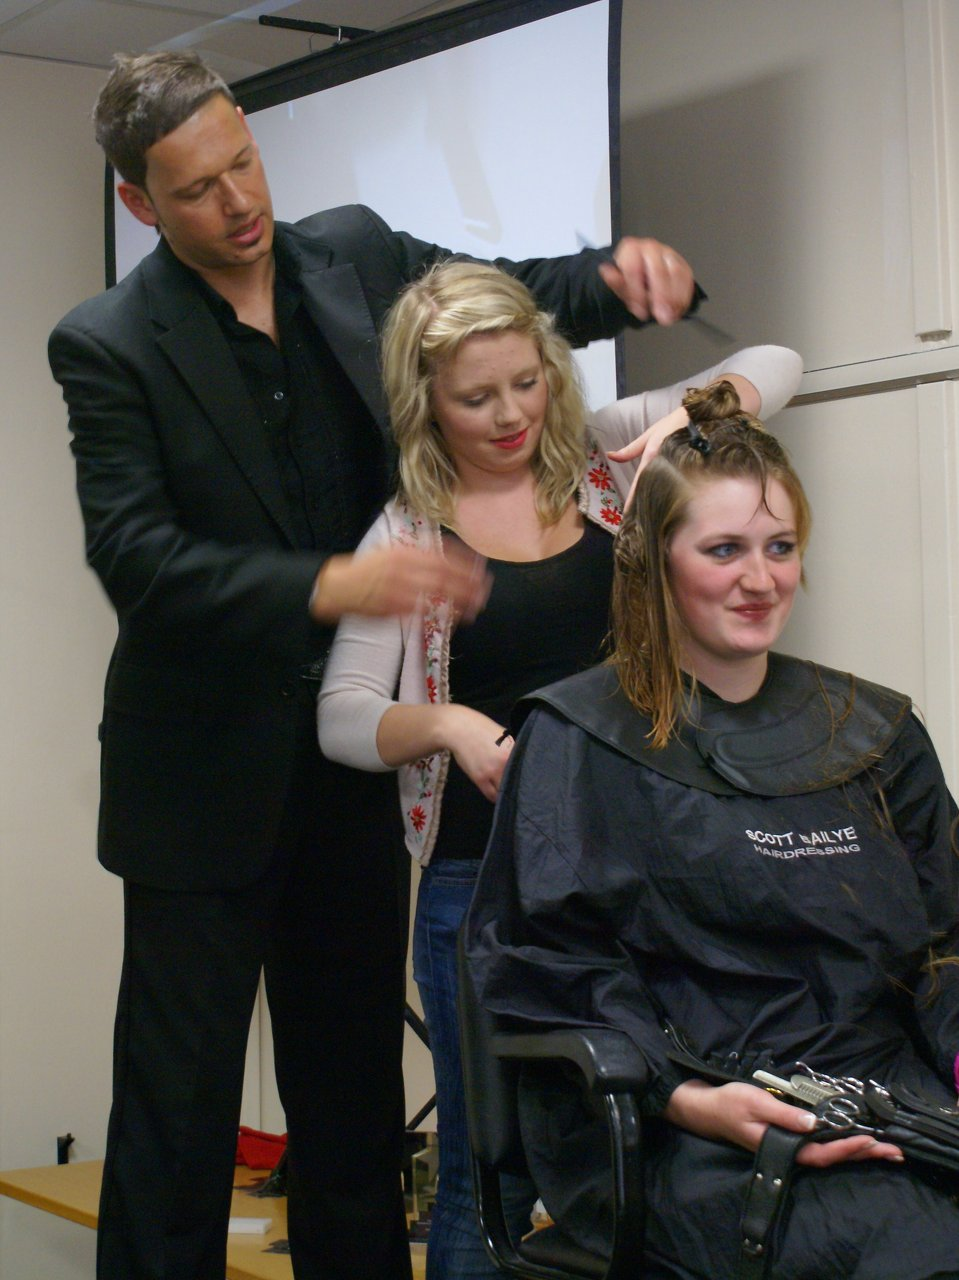 At Scott Bailye Hairdressing